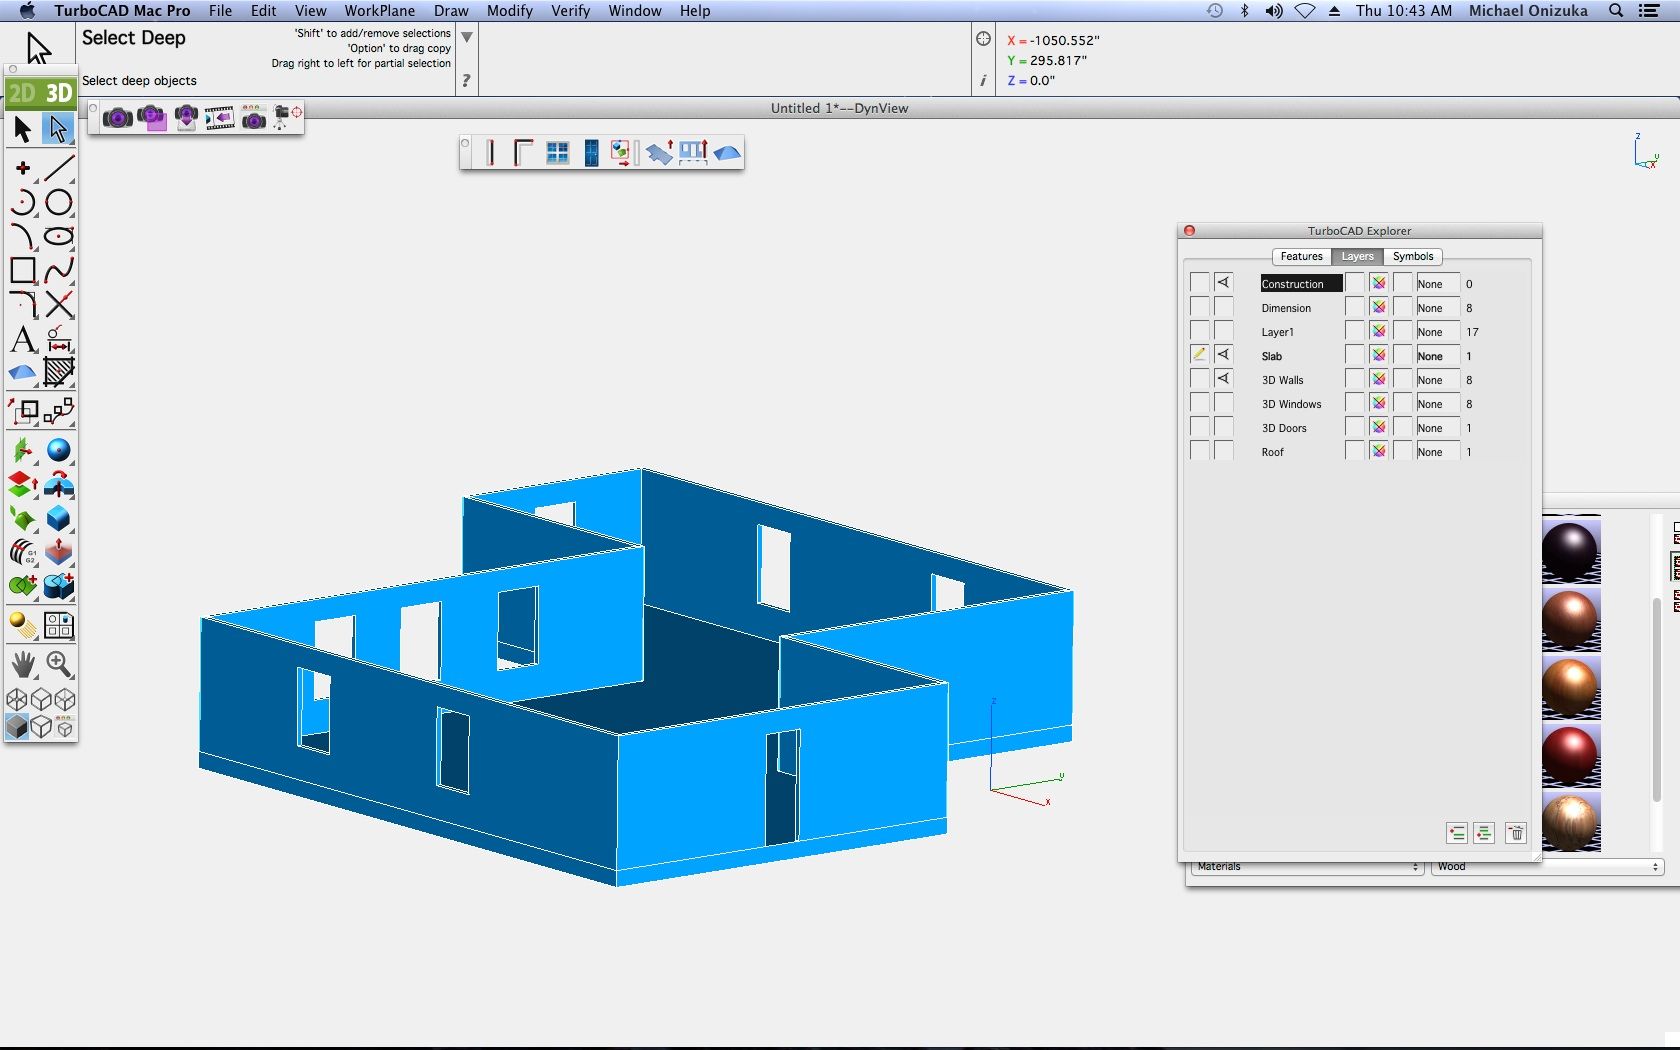 TurboCAD Mac Pro - Grundrisse